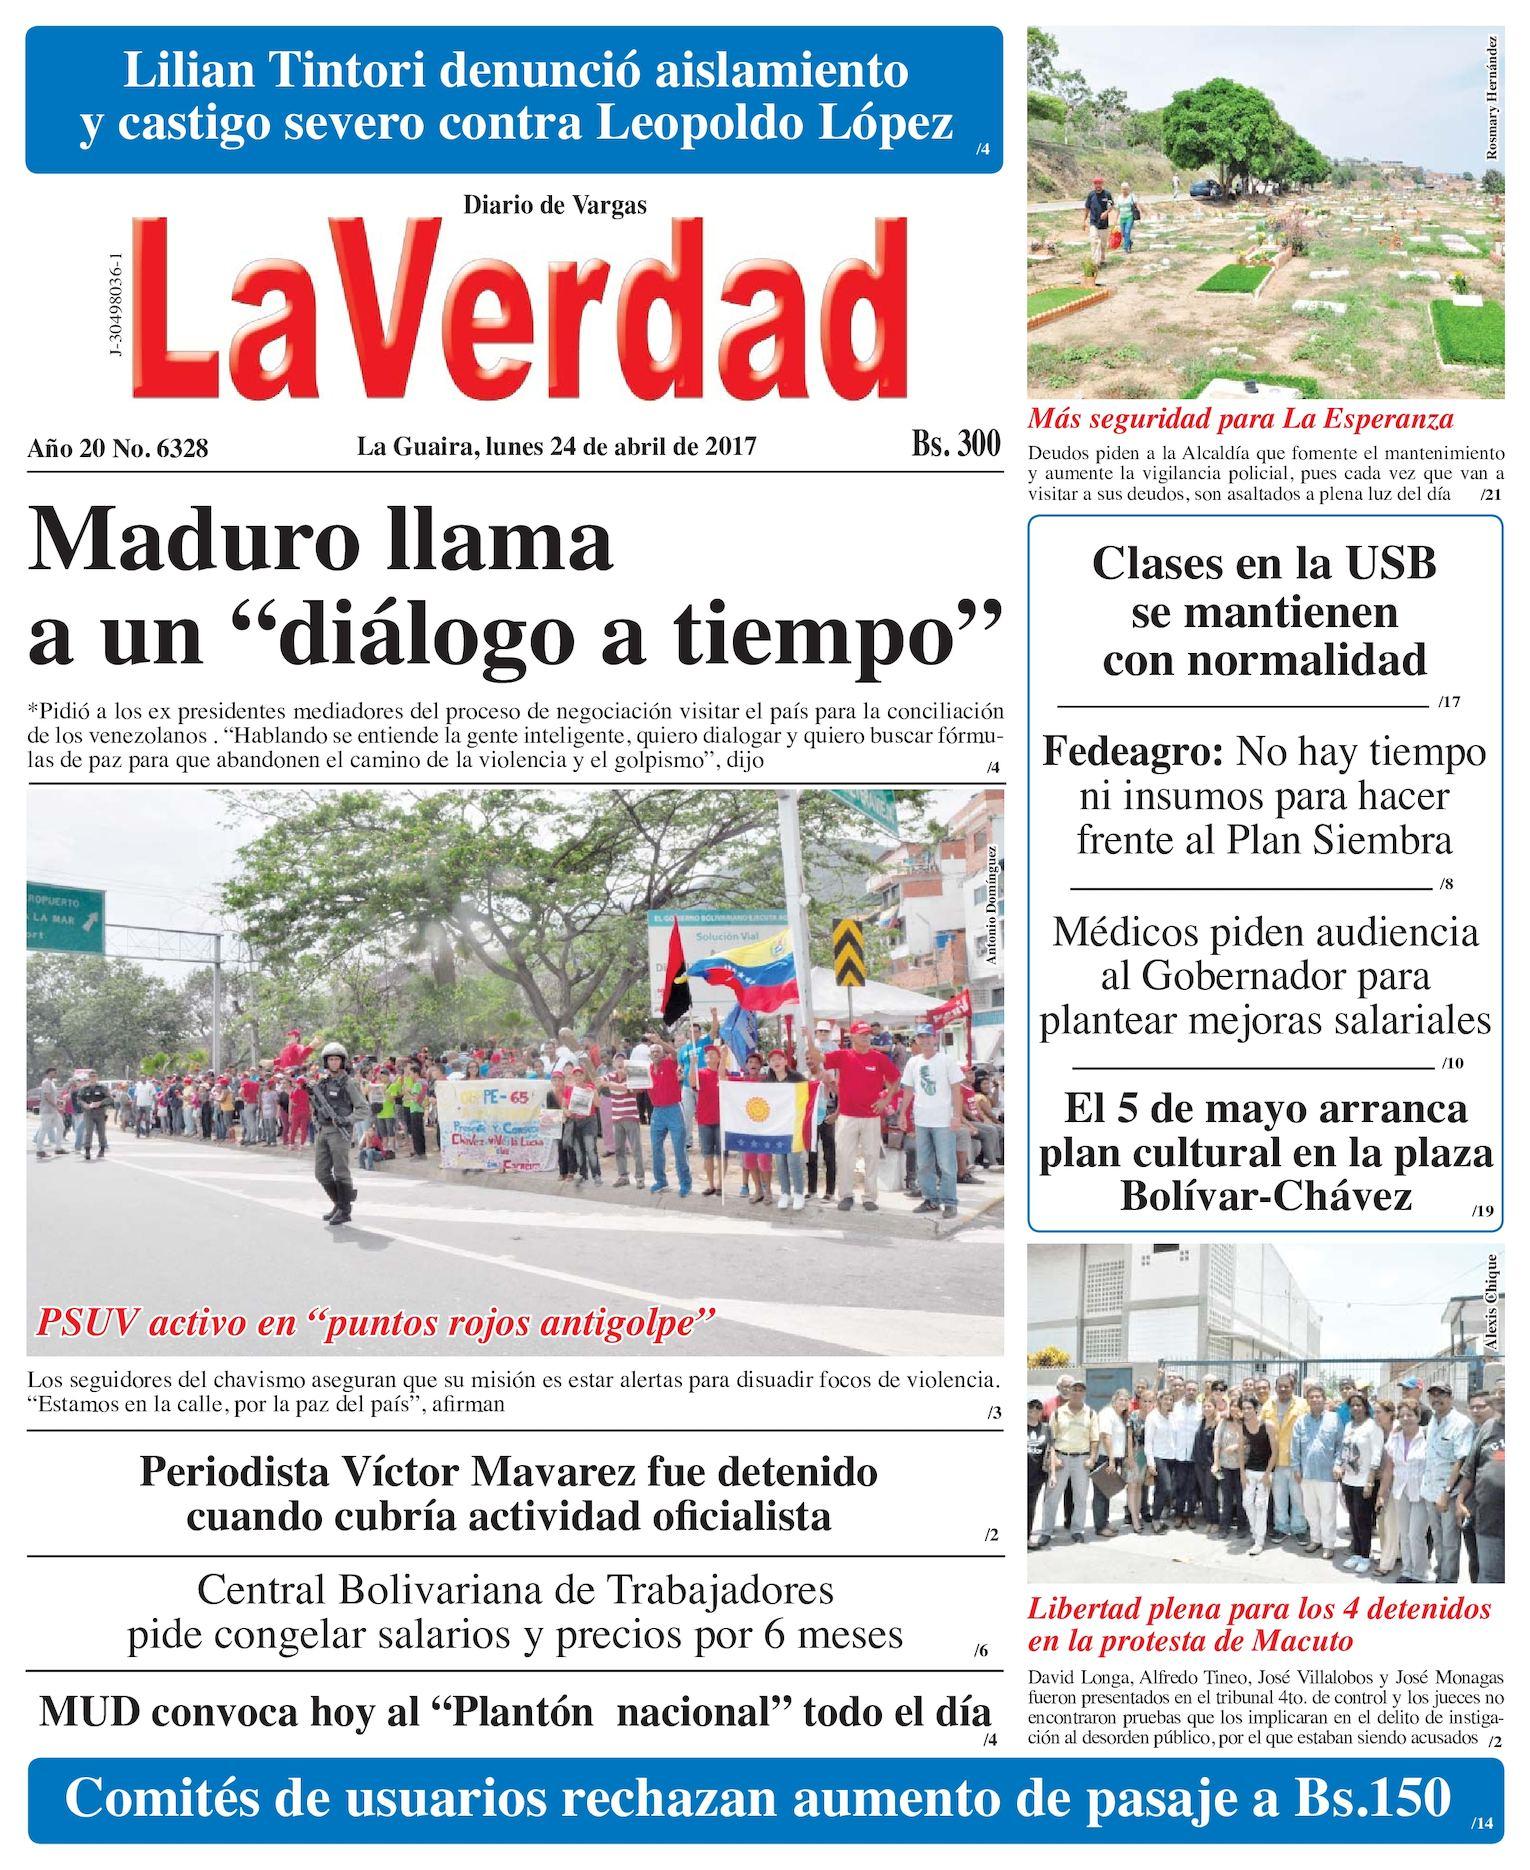 Calaméo - La Guaira. 24 de abril de 2017 Año 20 No. 6328